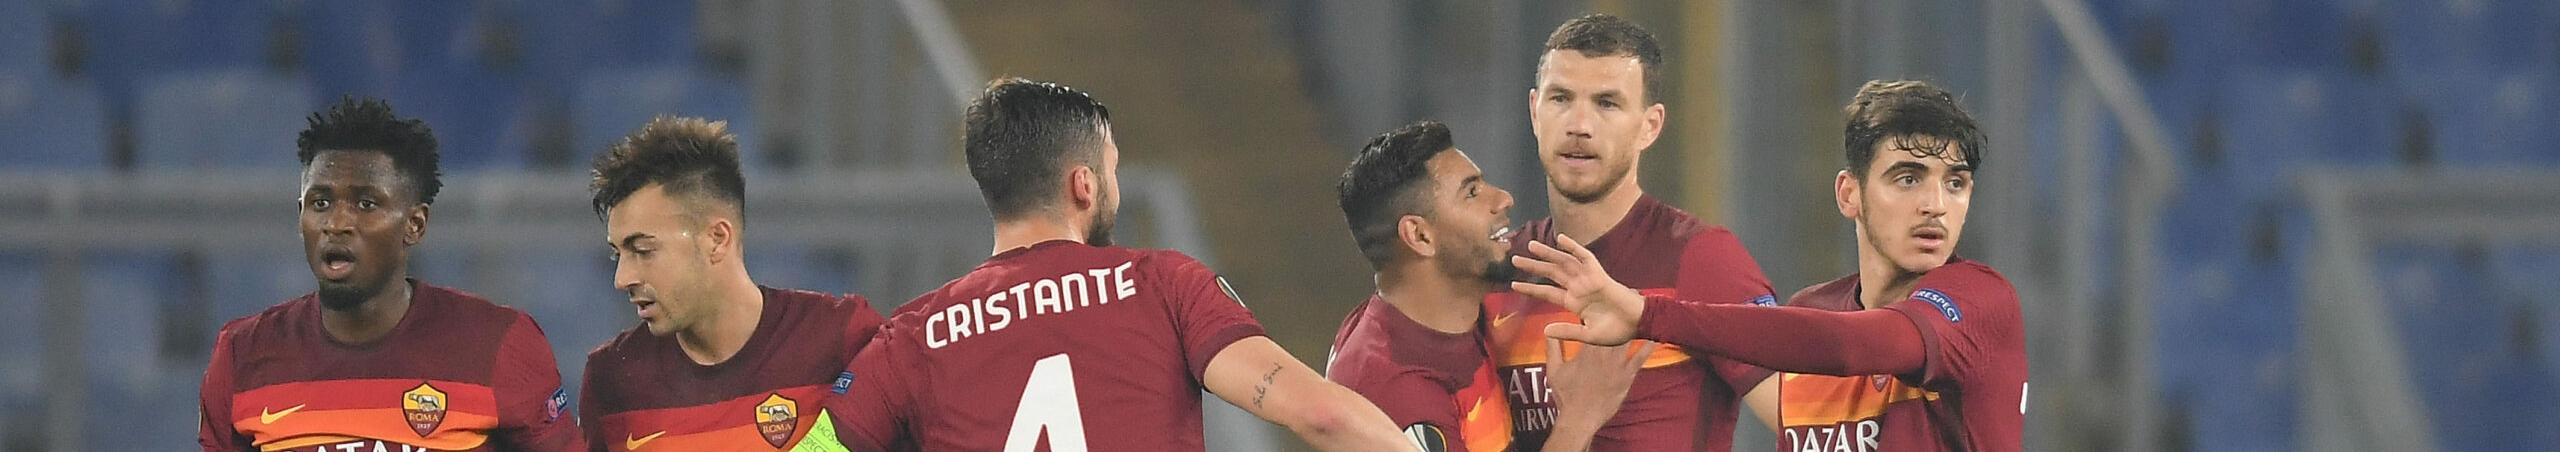 Pronostico Ajax-Roma, Fonseca va All In con Dzeko - le ultimissime